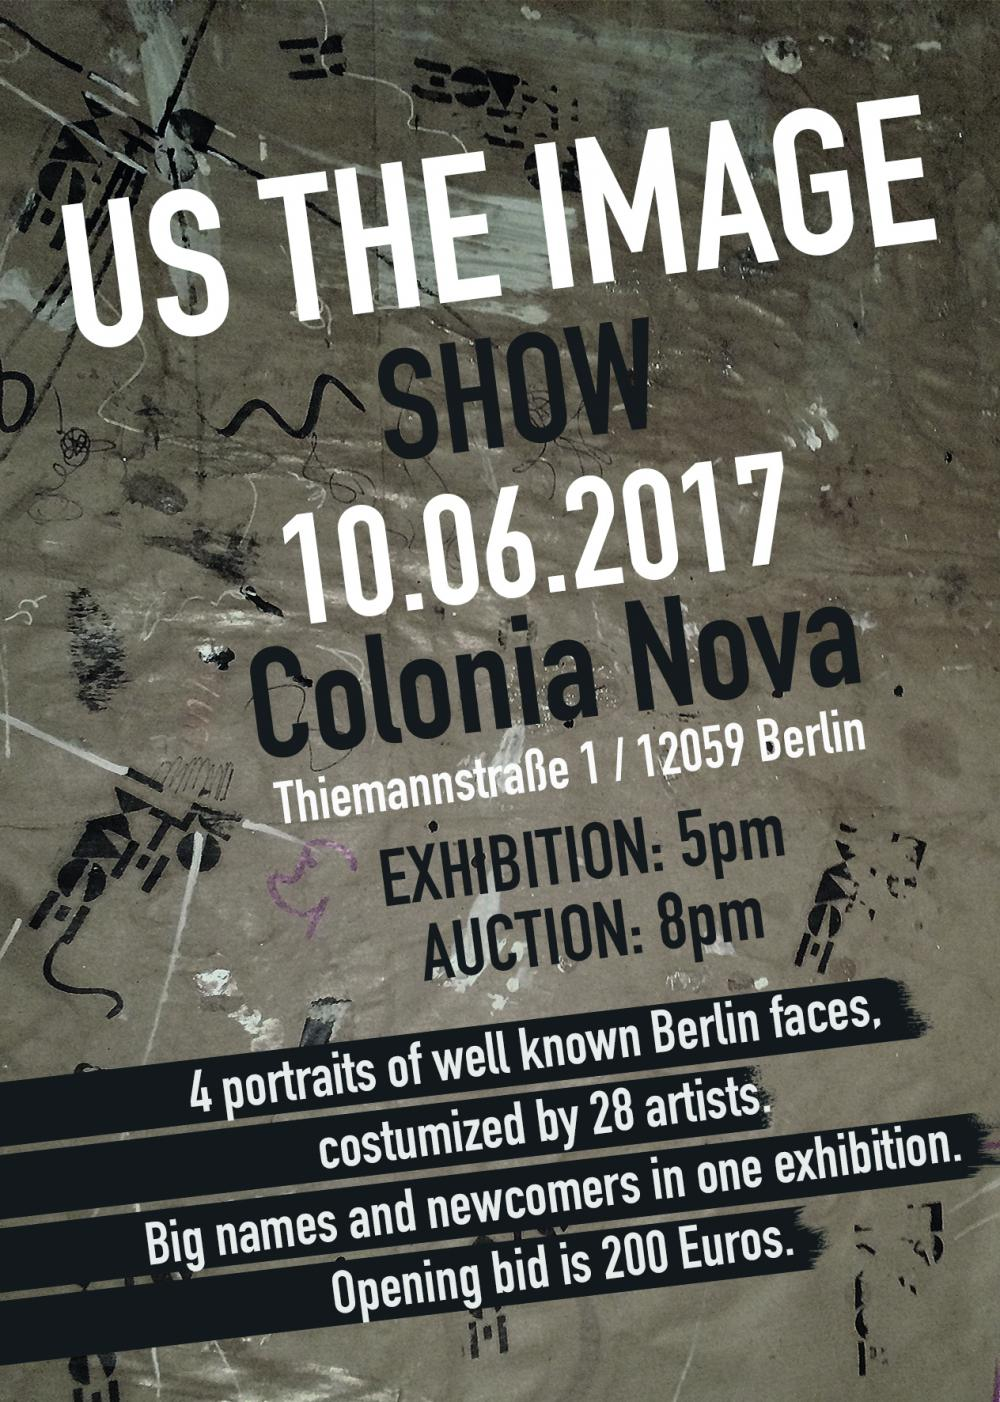 Colonia Nova - Auction & Exhibition